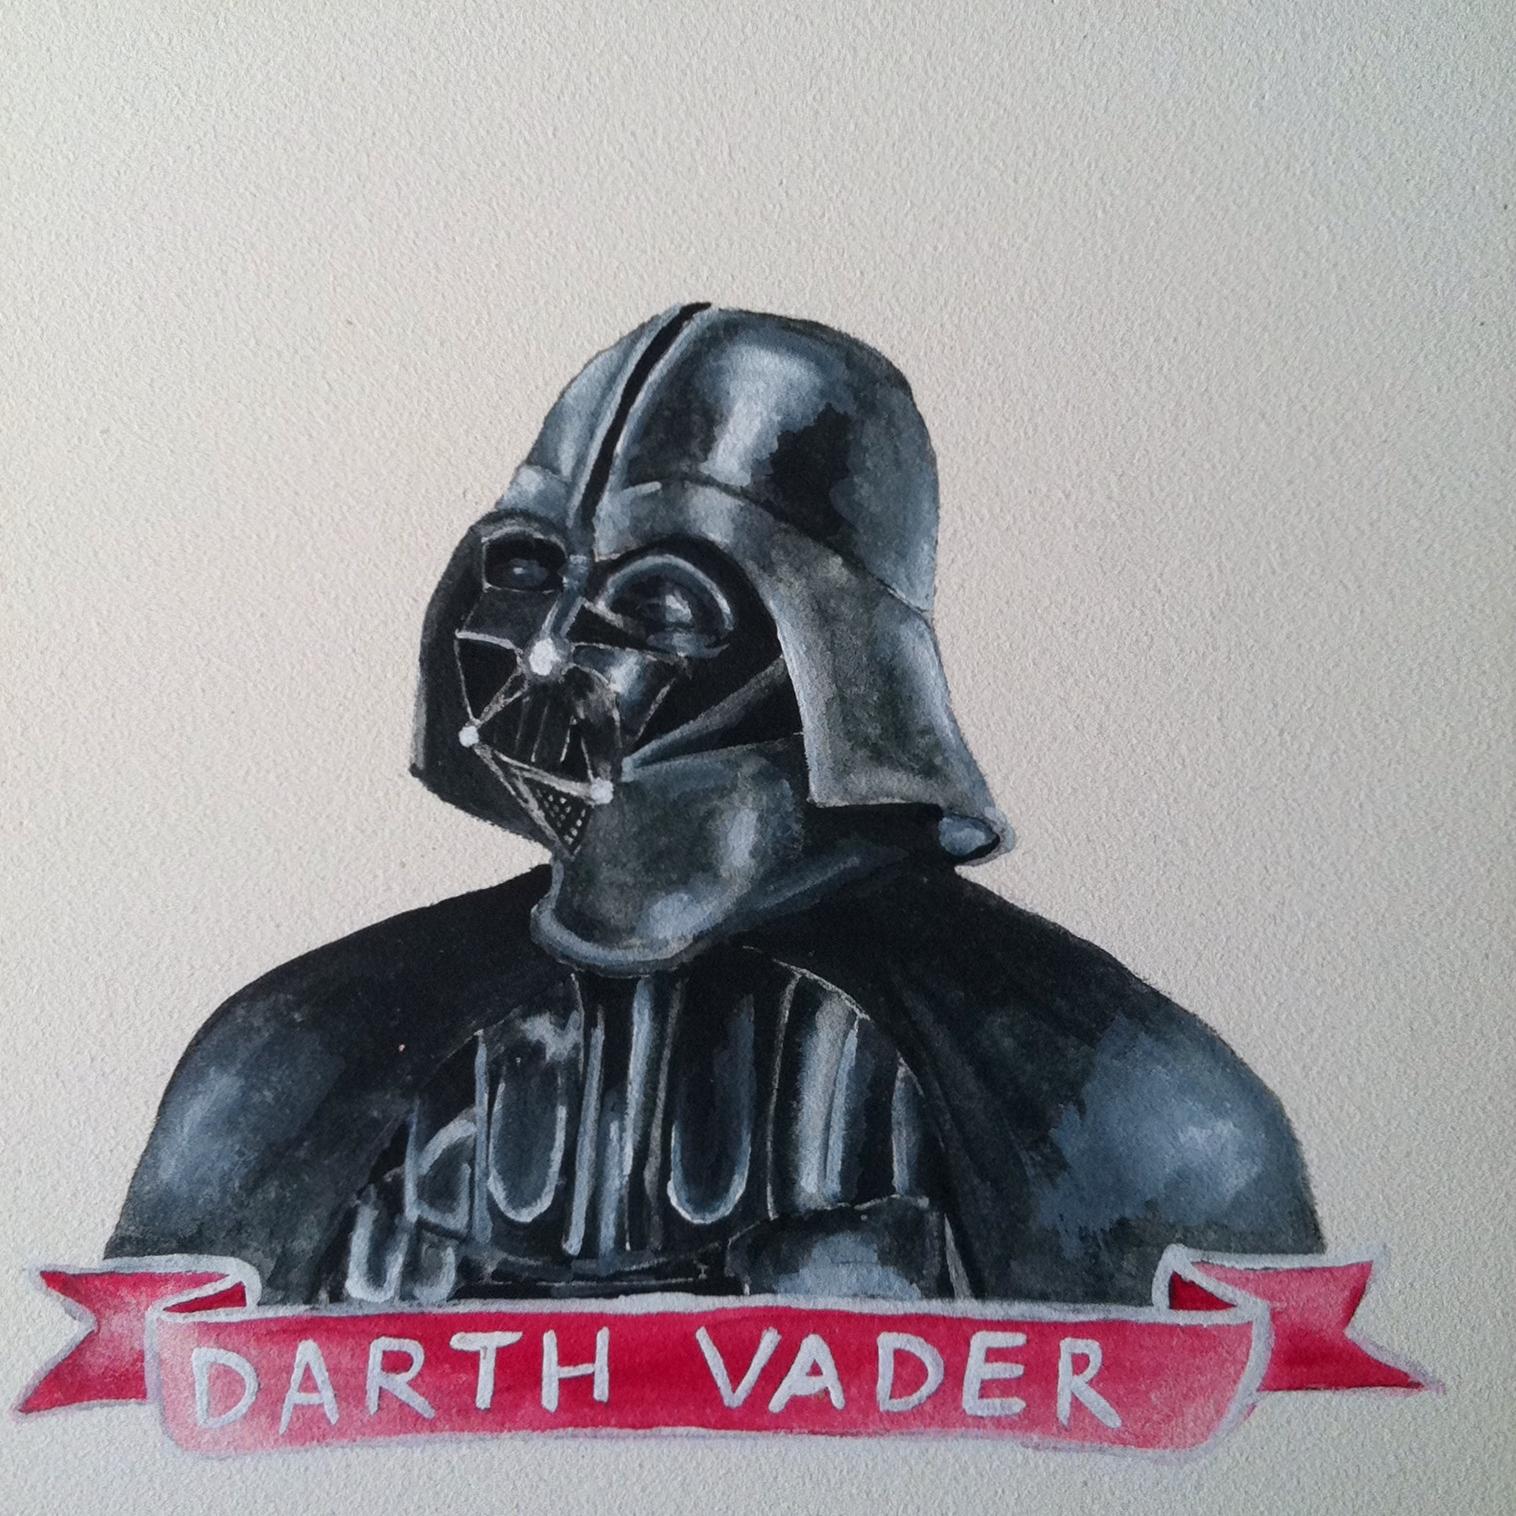 Talent Loves Company at Barbara Archer Gallery: 365 portraits by Lydia Walls - Darth Vader